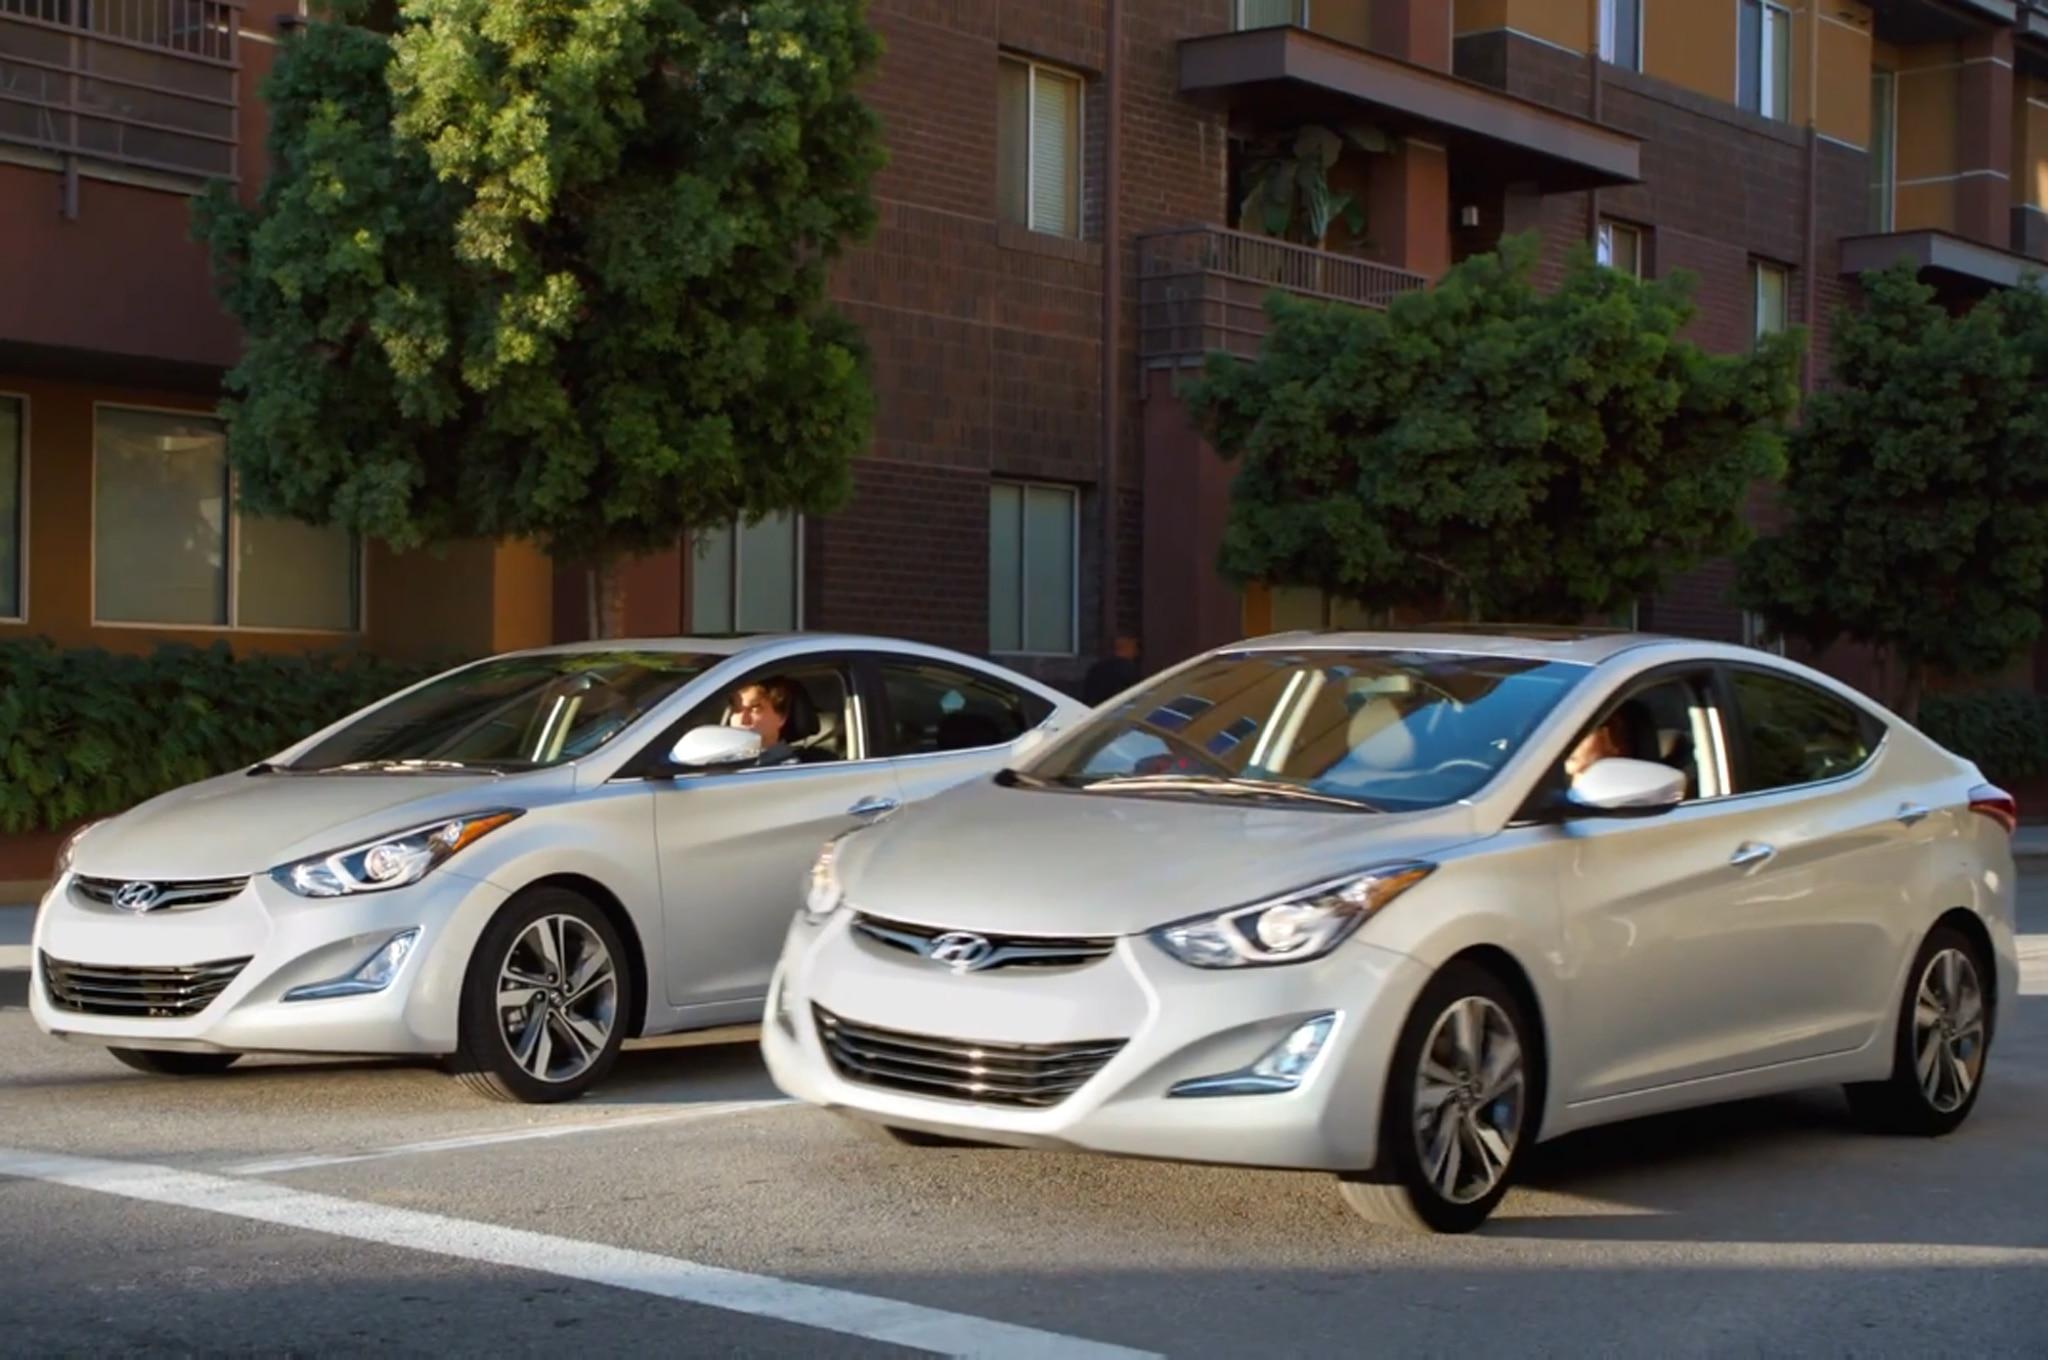 2014 Hyundai Elantra Super Bowl Pair